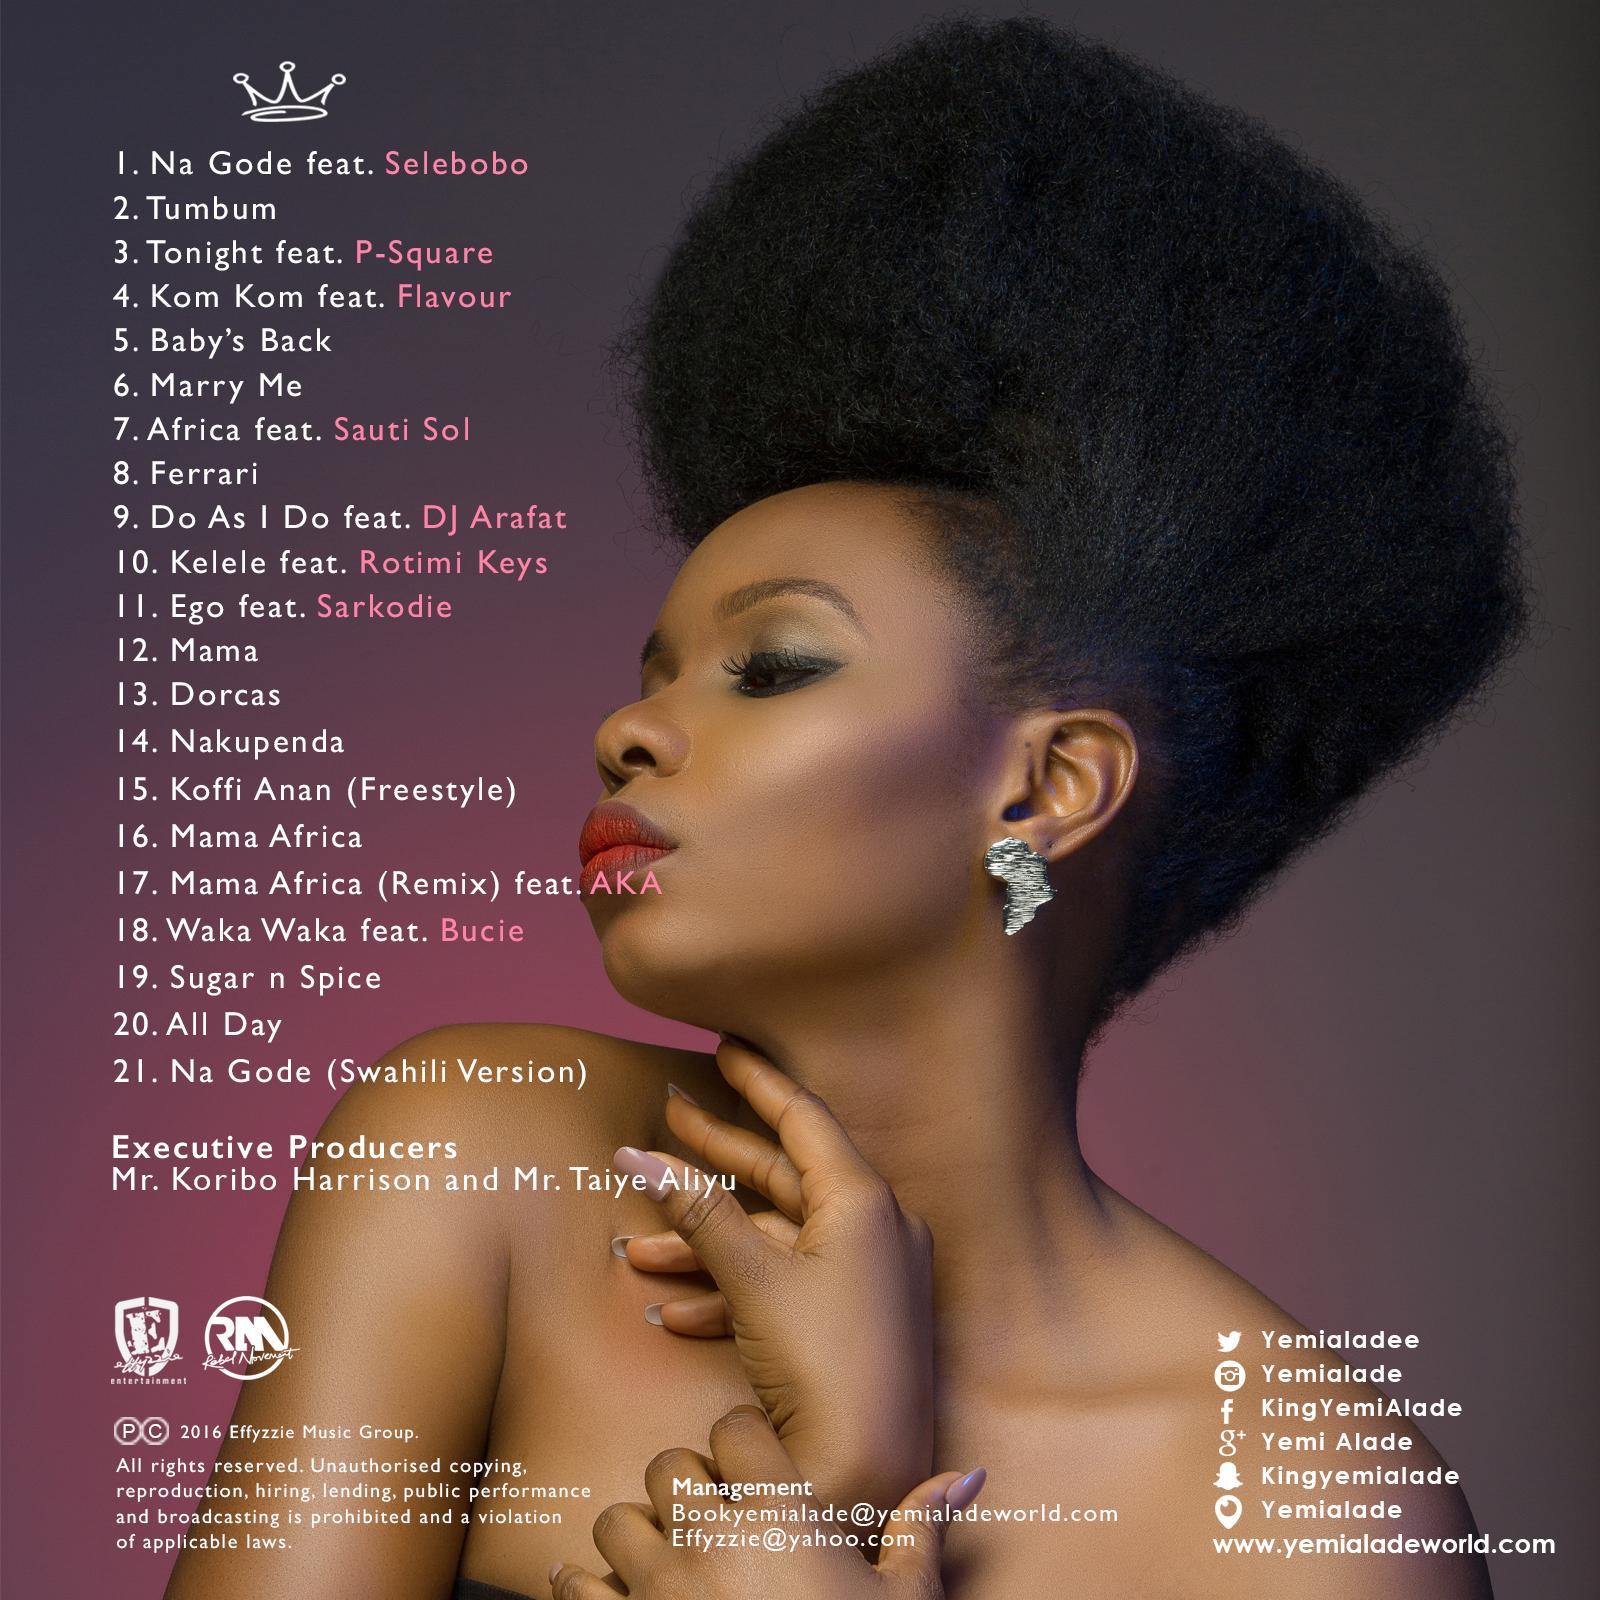 Yemi Alade - Mama Africa [Deluxe Album BackTracklist]